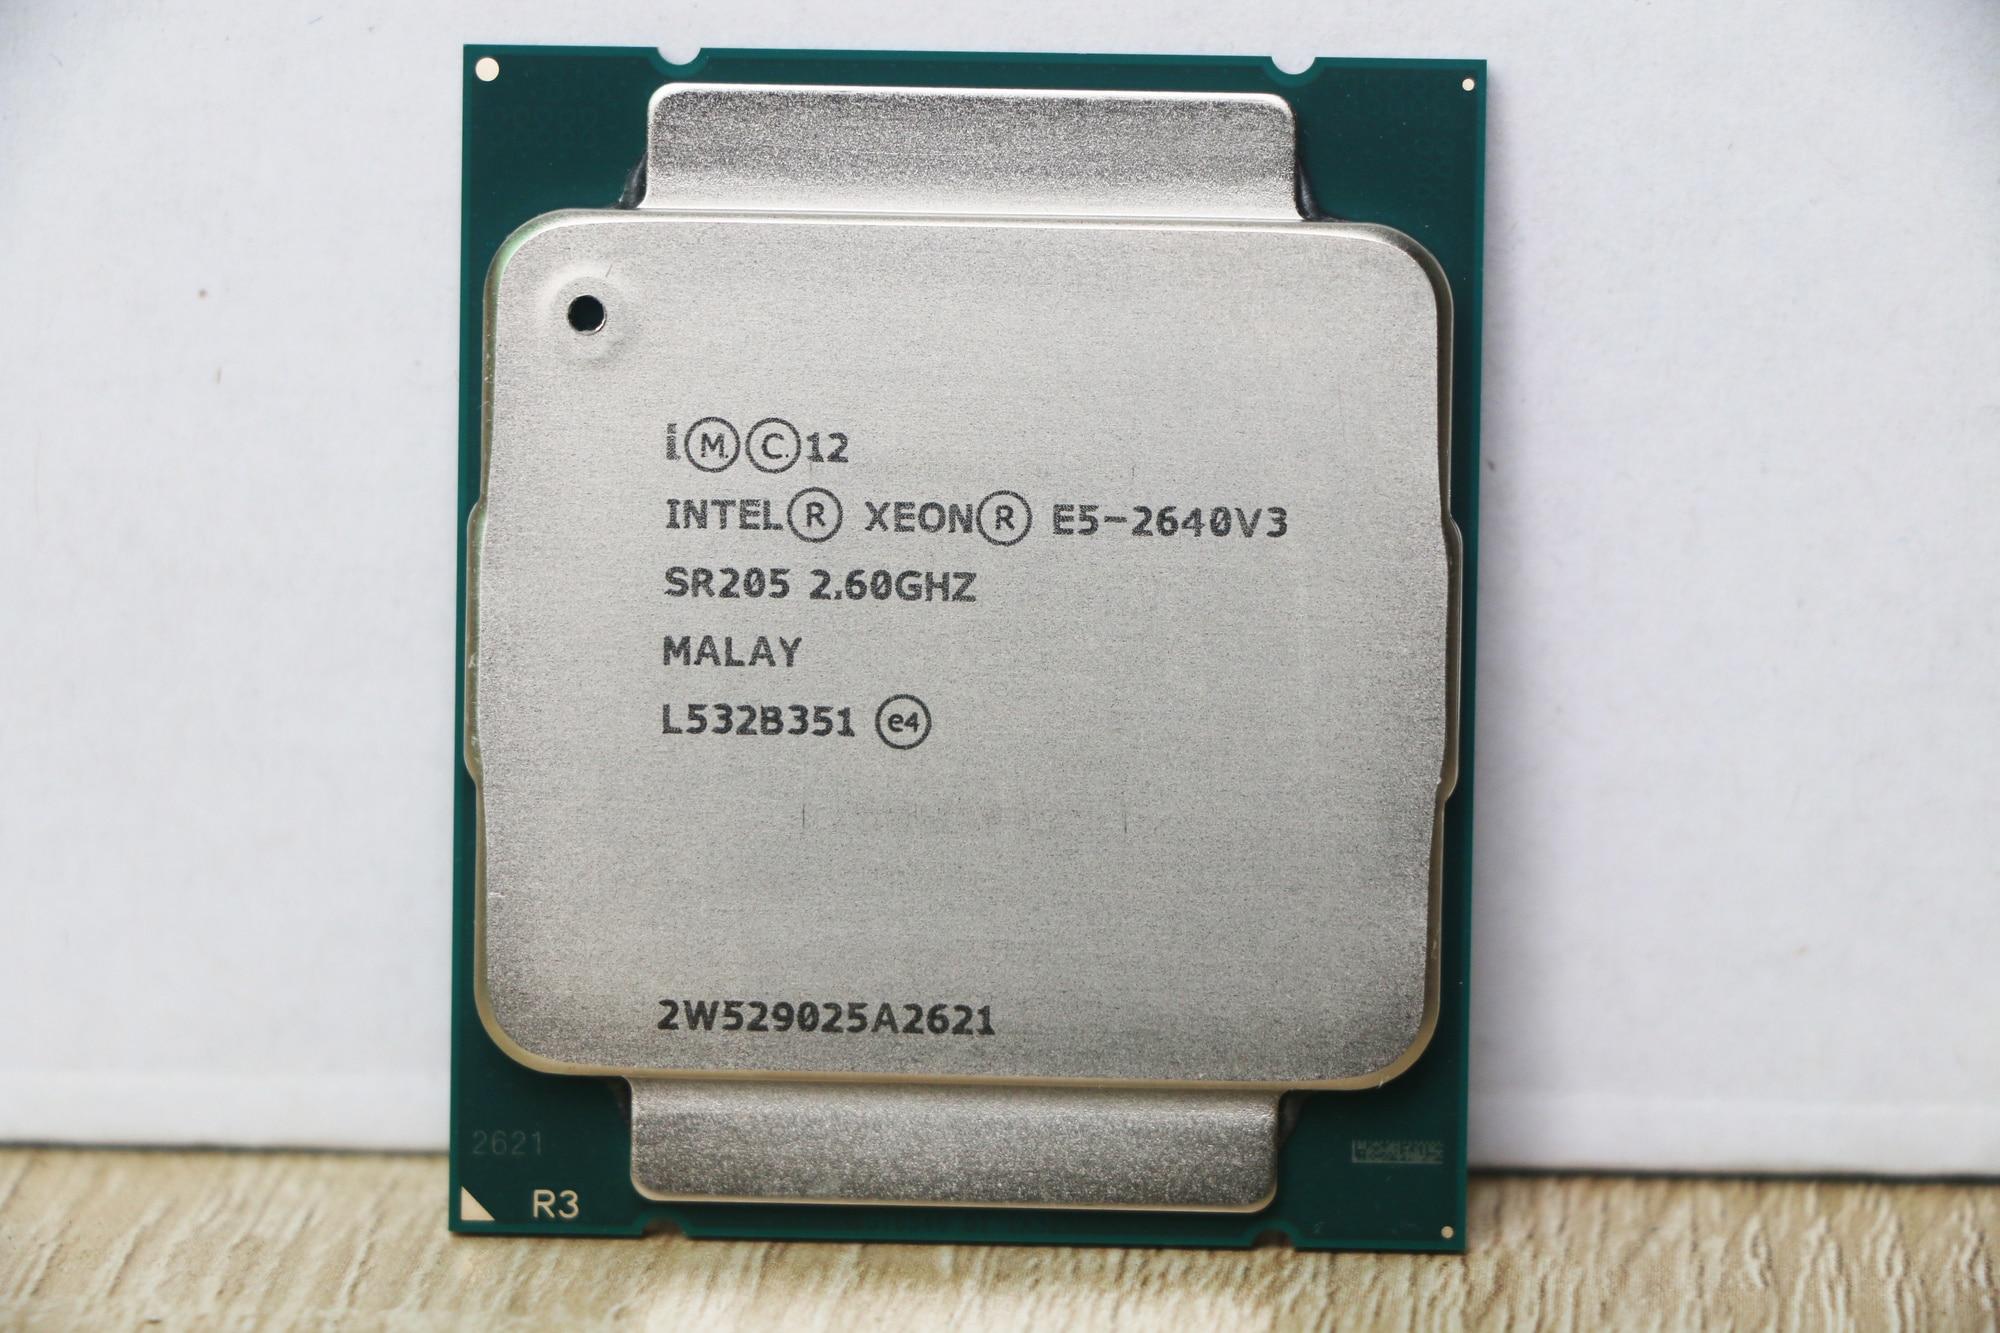 Intel processor Xeon E5 2640 V3 sr205 2.6GHz 8-core 90W socket LGA 2011-3 CPU E5 2640v3 CPU enlarge